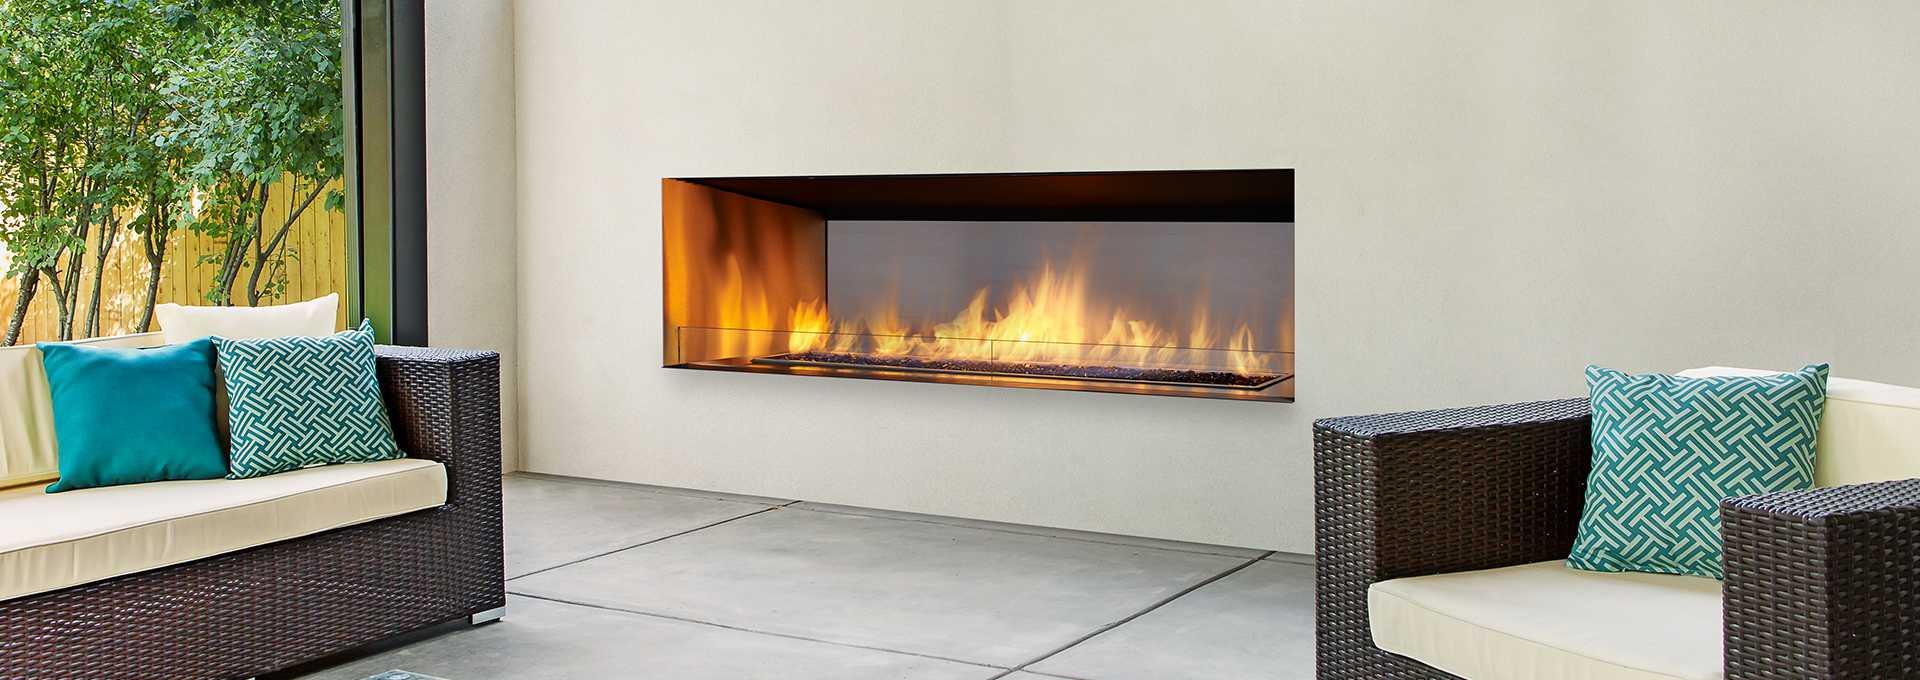 Horizon HZO60 Outdoor Gas Fireplace-1